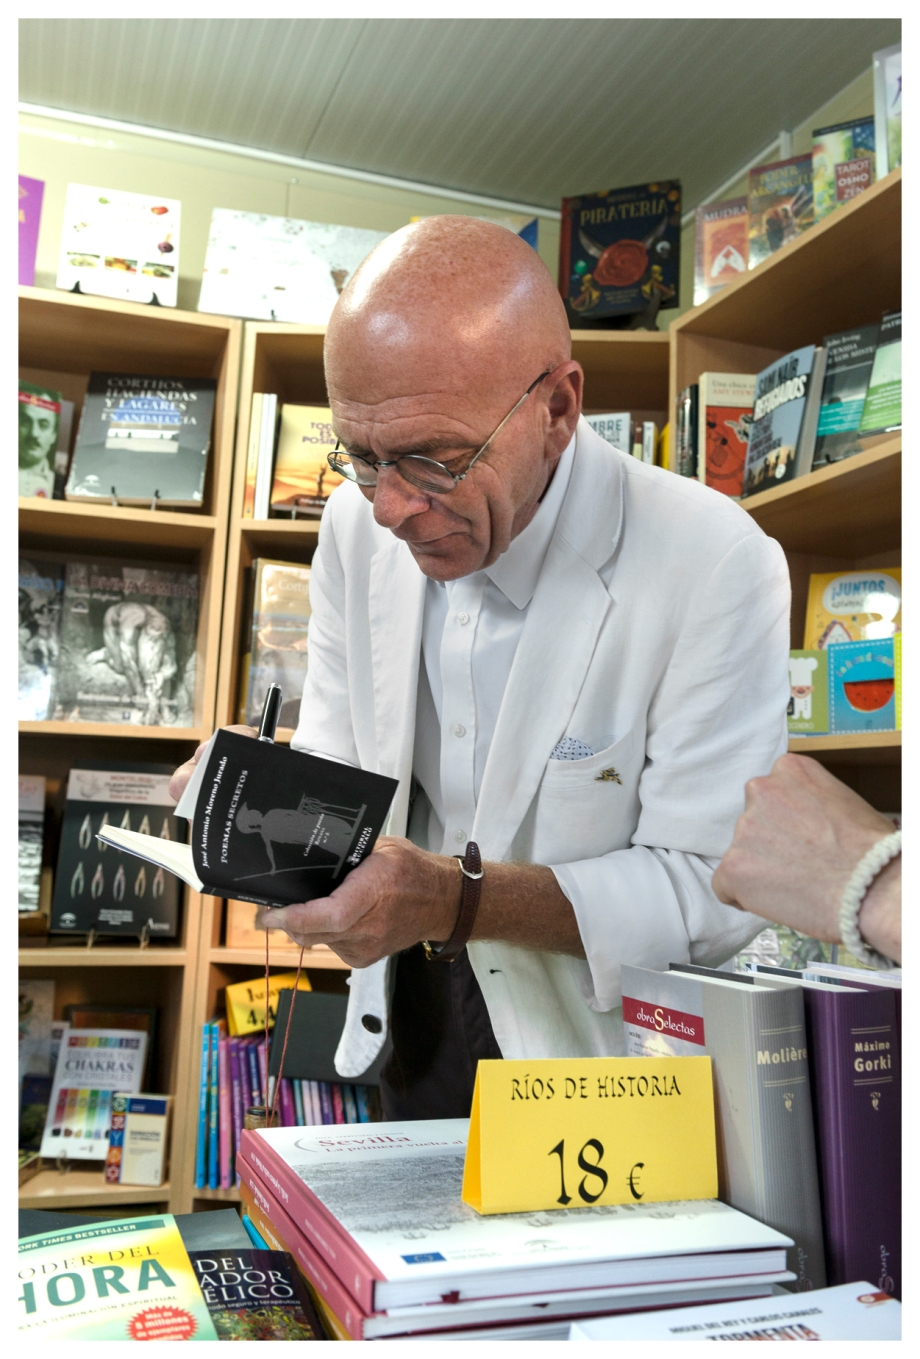 Daniel Lebrato firmando ejemplares ajenos en la feria del libro foto Pepe Morán 19 05 2017.jpg